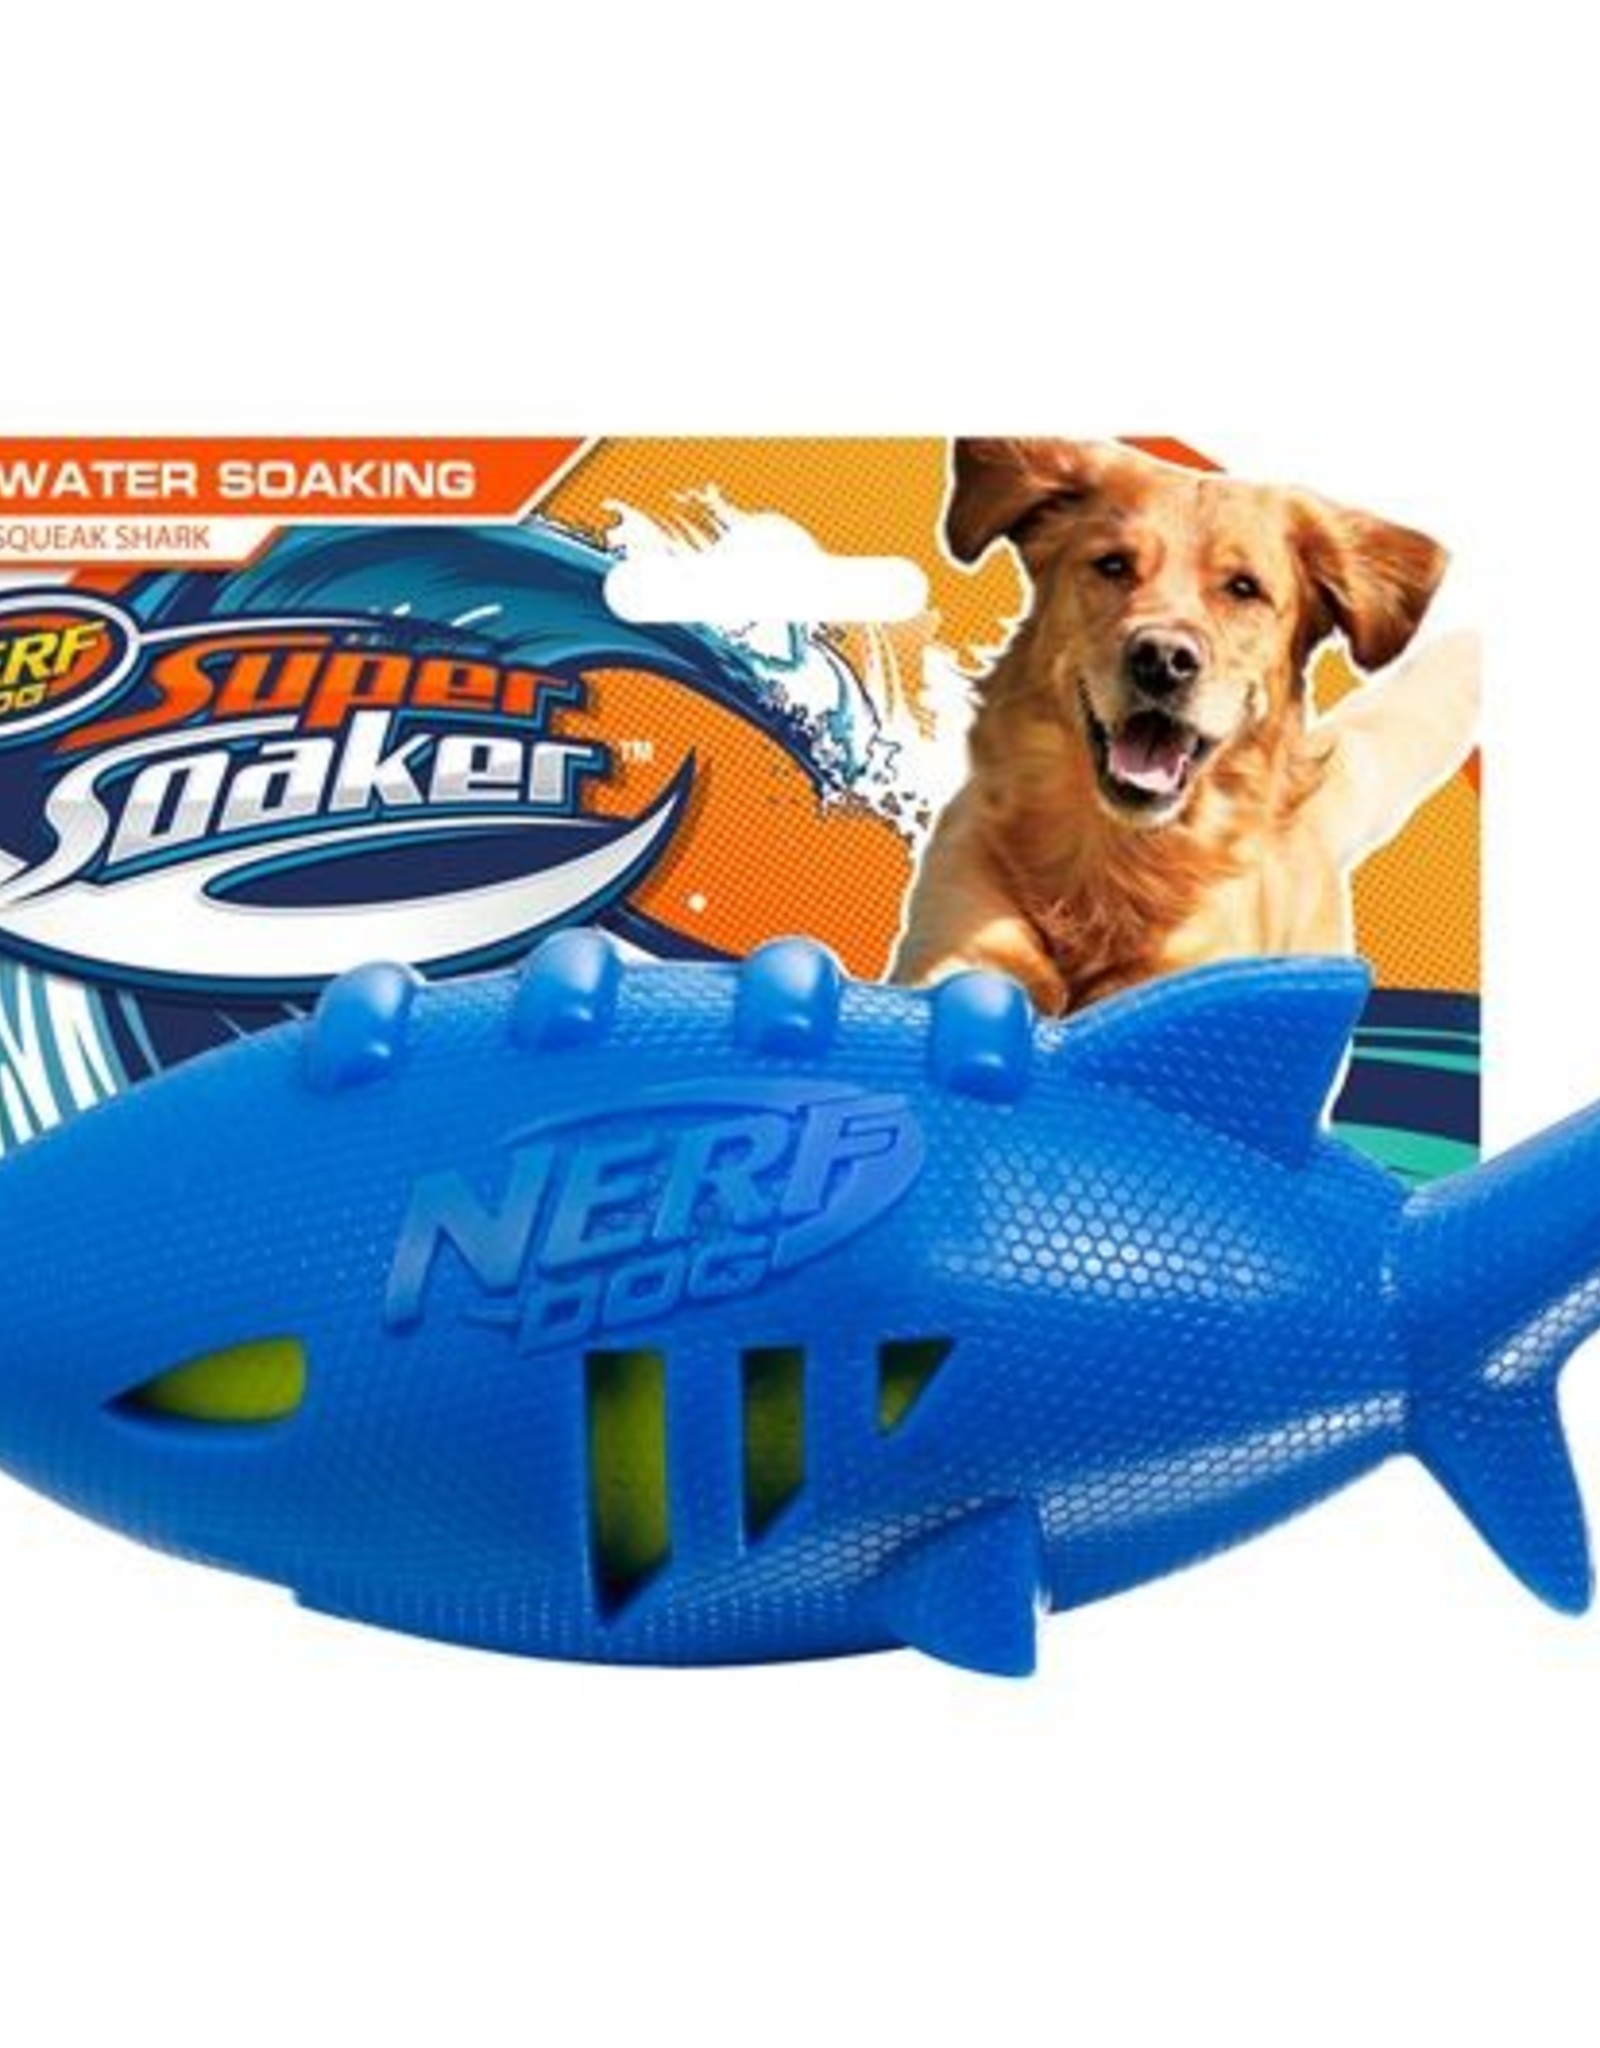 Nerf Super Soaker Shark Rubber Football Dog Toy, 18cm